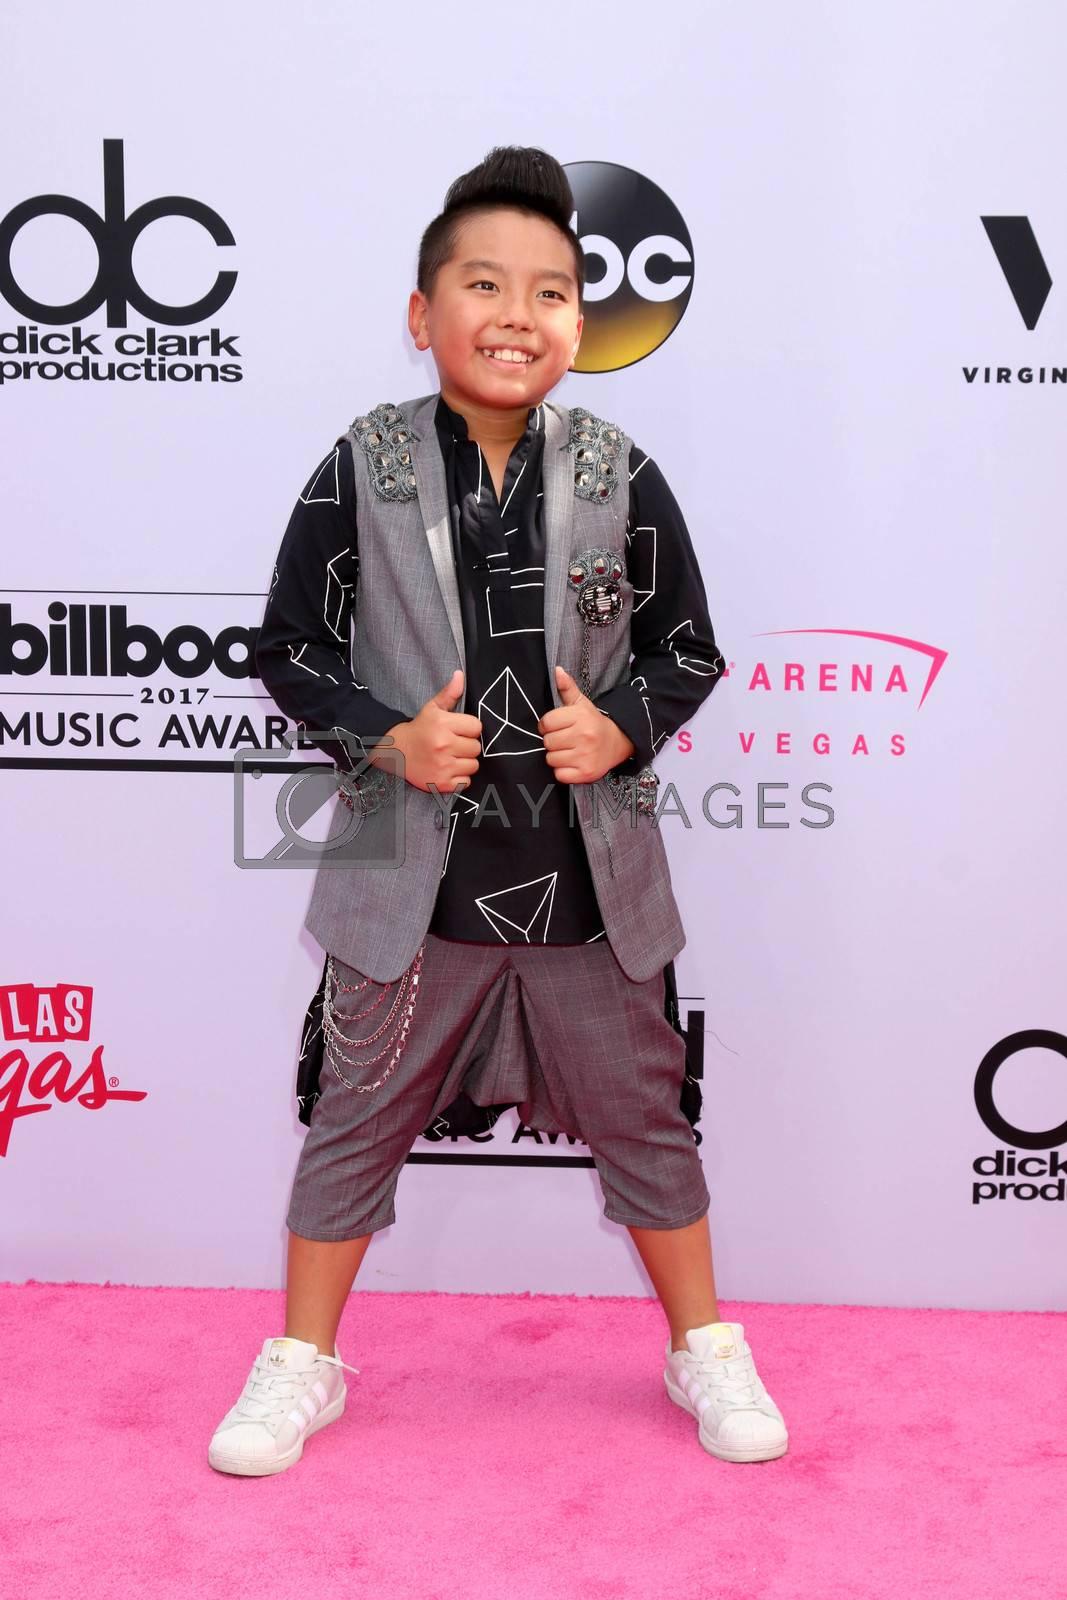 Aidan Prince Xiong at the 2017 Billboard Awards Arrivals, T-Mobile Arena, Las Vegas, NV 05-21-17